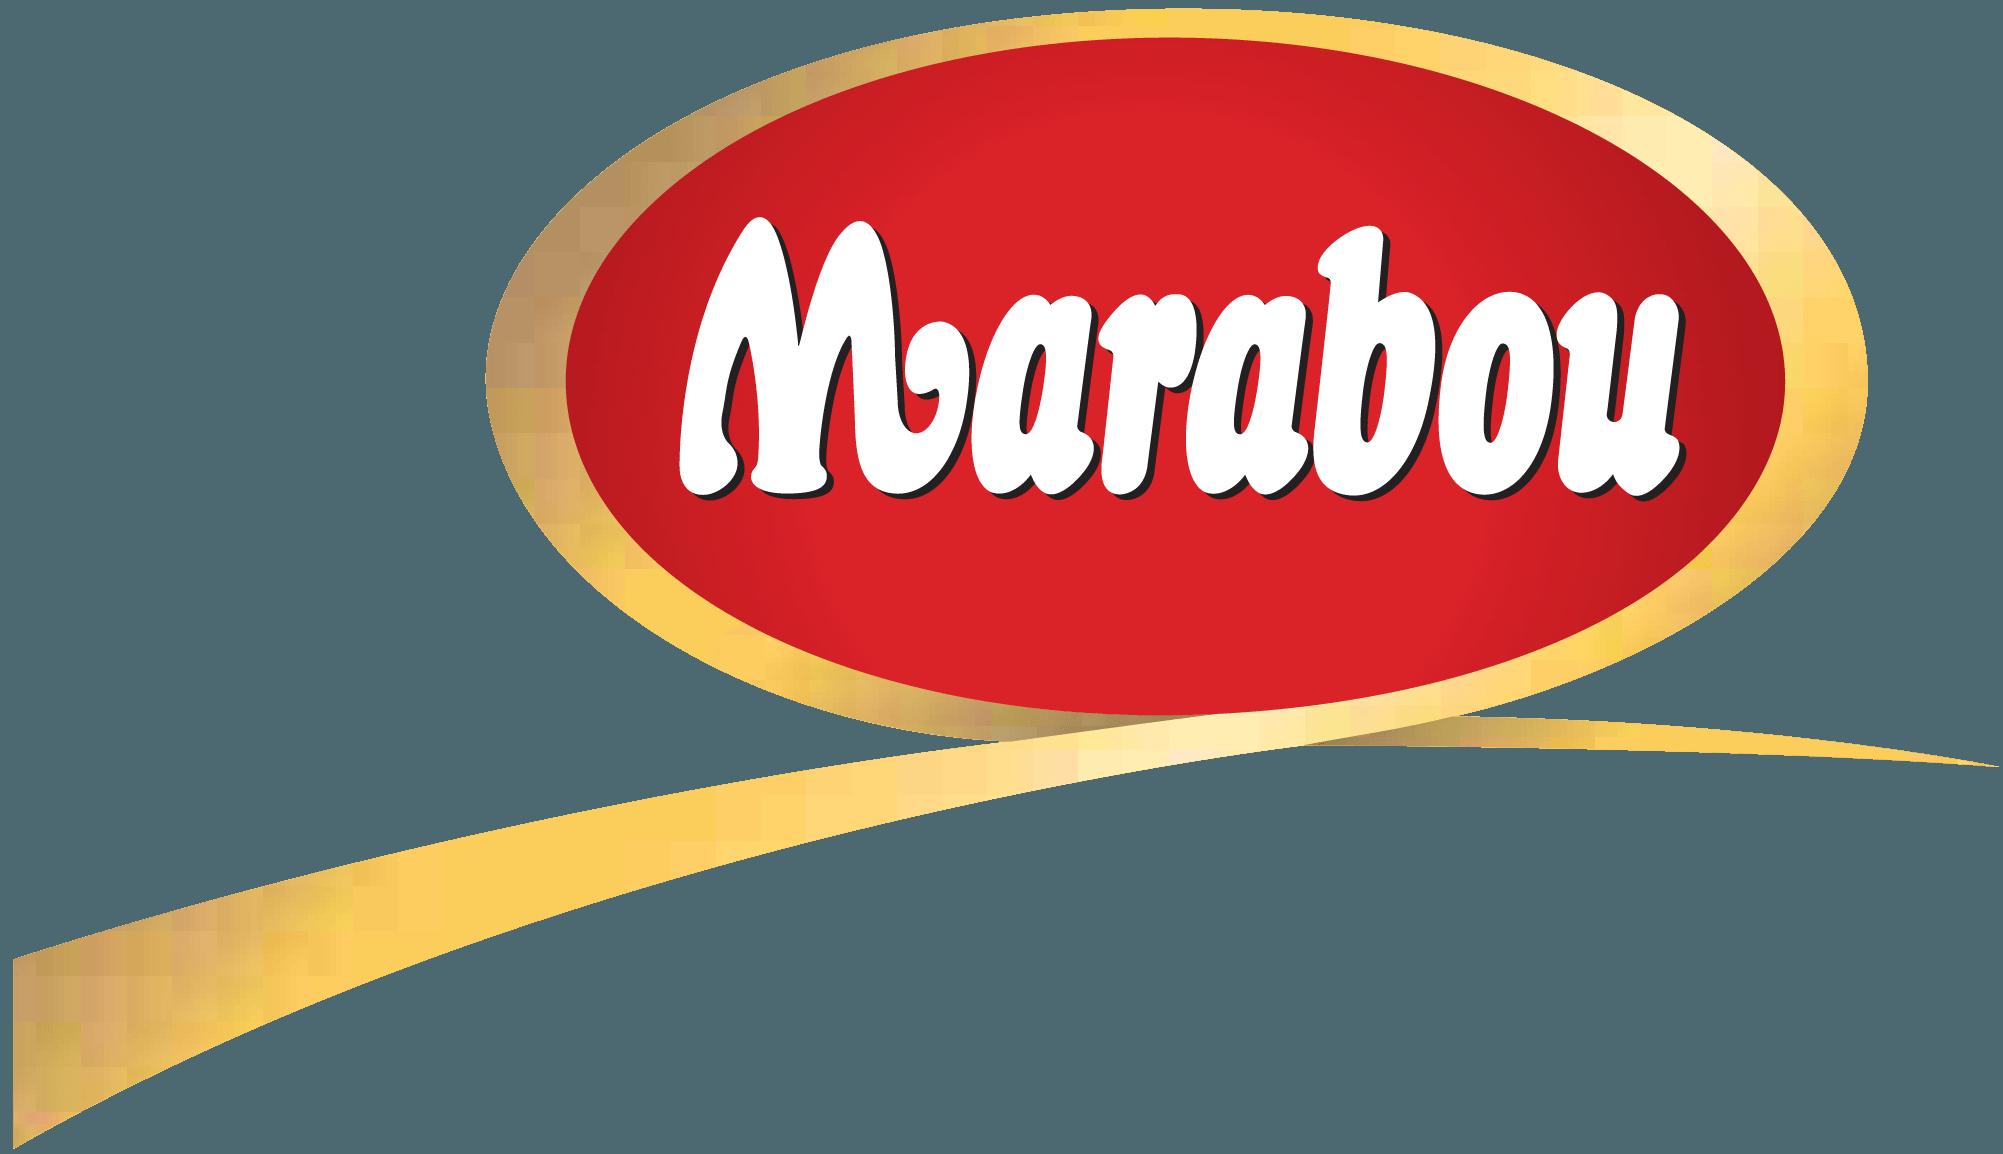 marabou logo vector icon template clipart free download